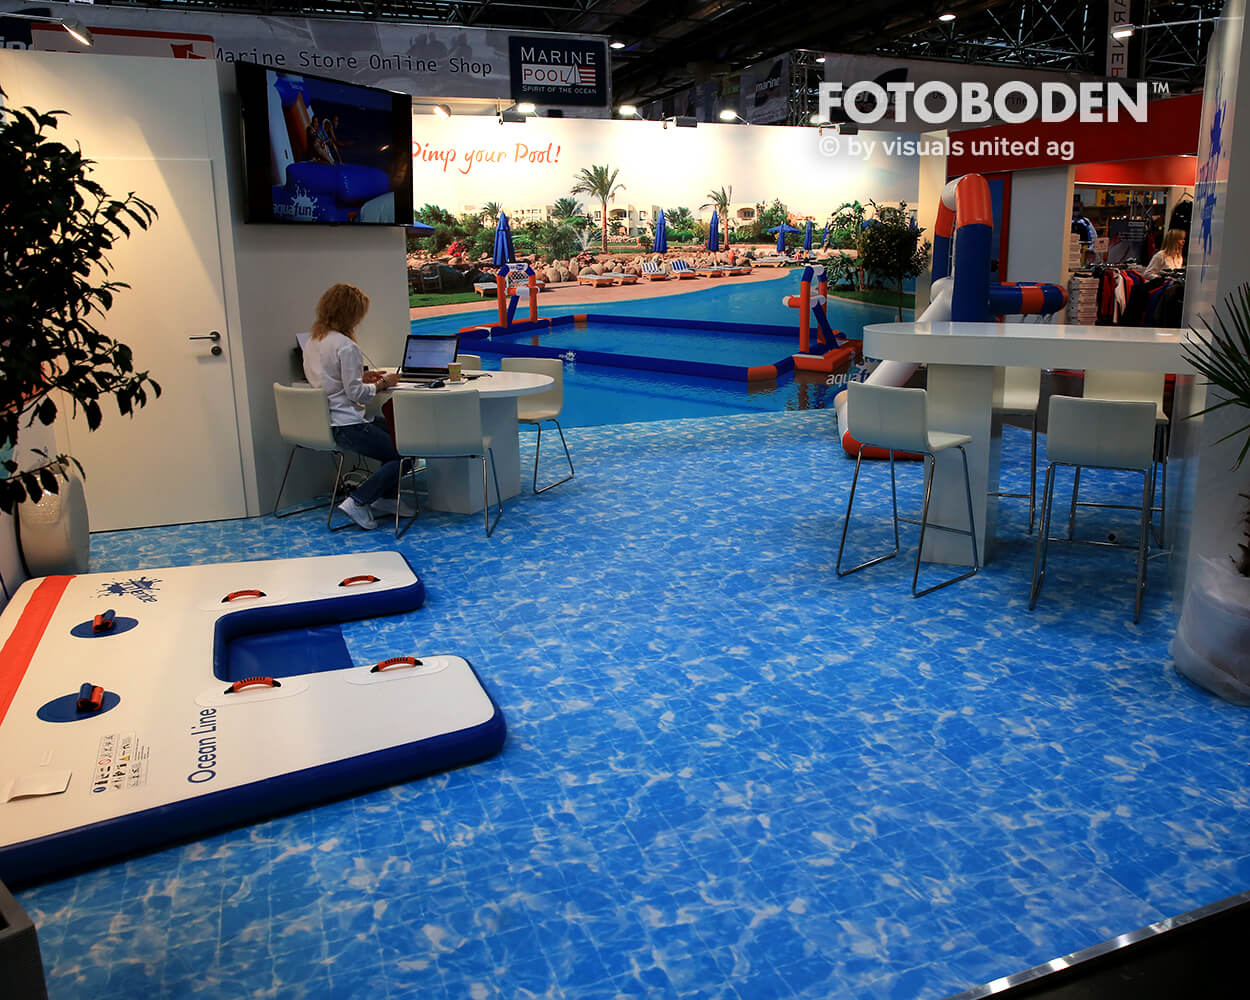 Boot2018 Fotoboden Messeboden Tradeshow Flooring Bodengestaltung Messe Bodendesign Messedesign Design Boden Messegestaltung 10